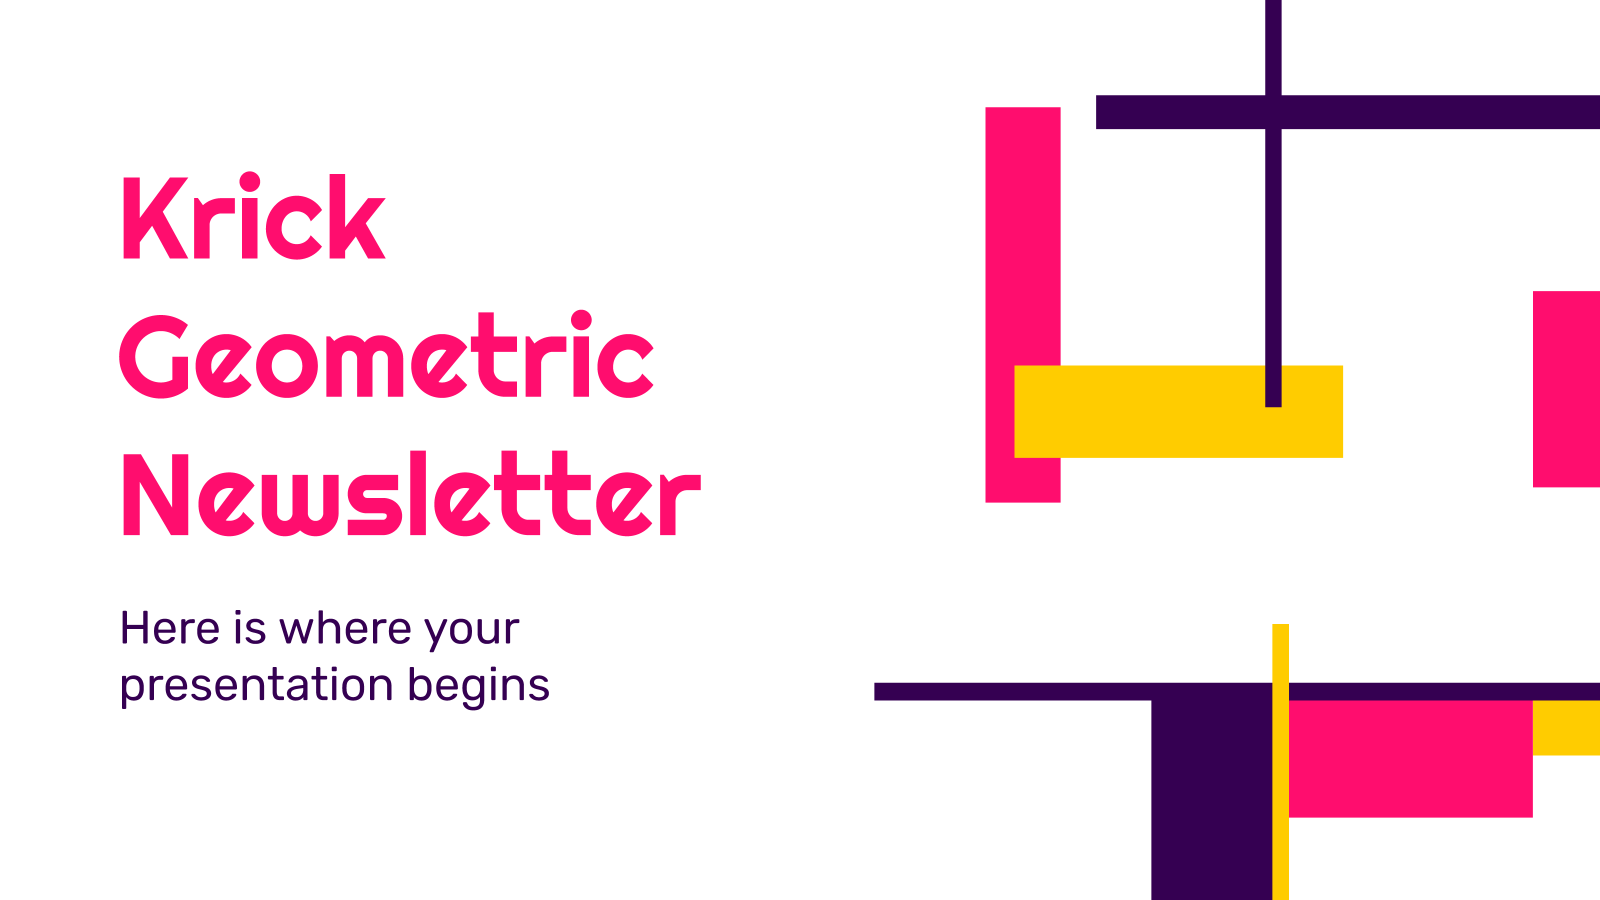 Modelo de apresentação Newsletter geométrico Krick